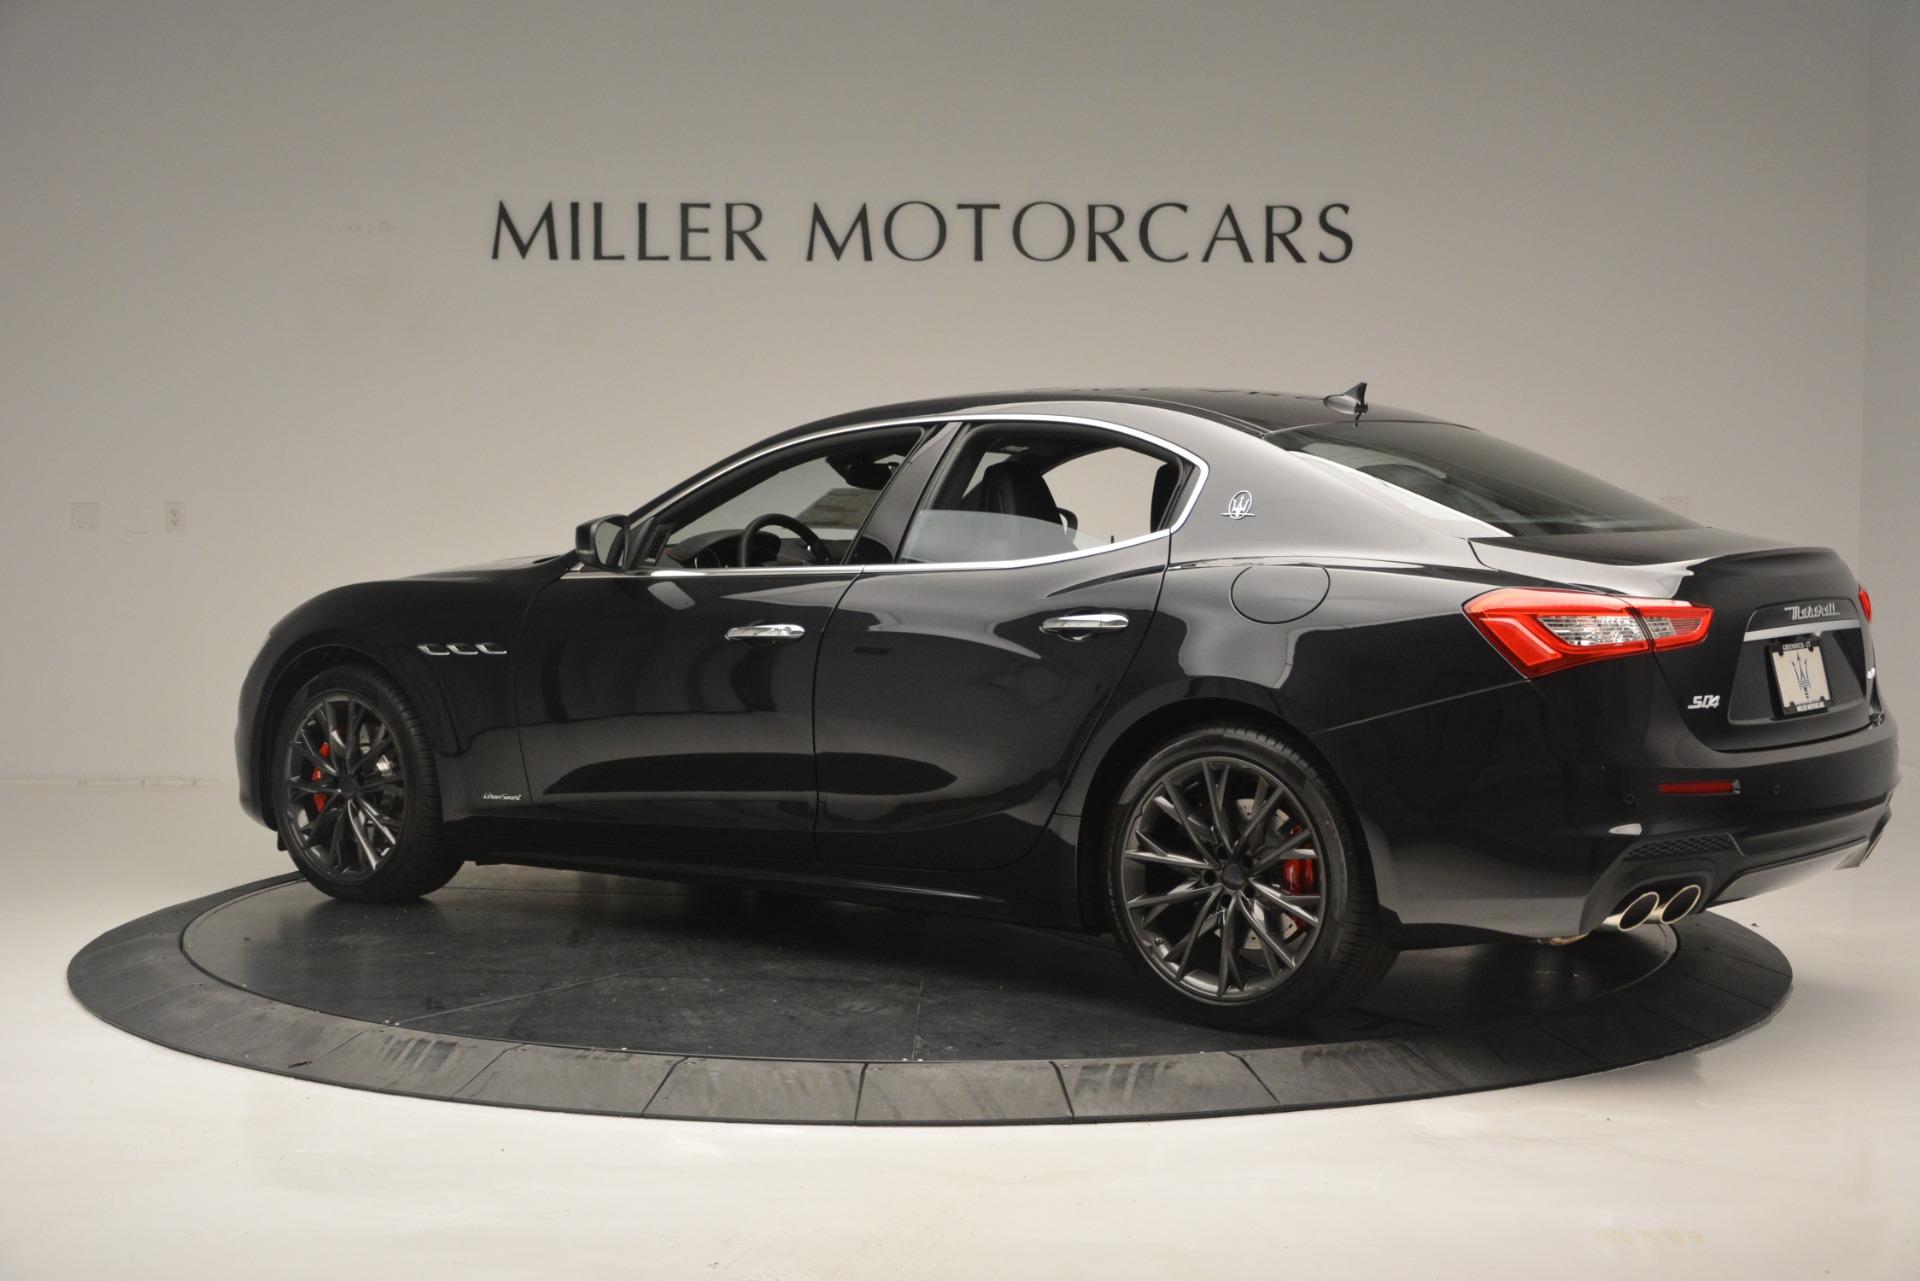 New 2019 Maserati Ghibli S Q4 GranSport For Sale In Greenwich, CT 2765_p4